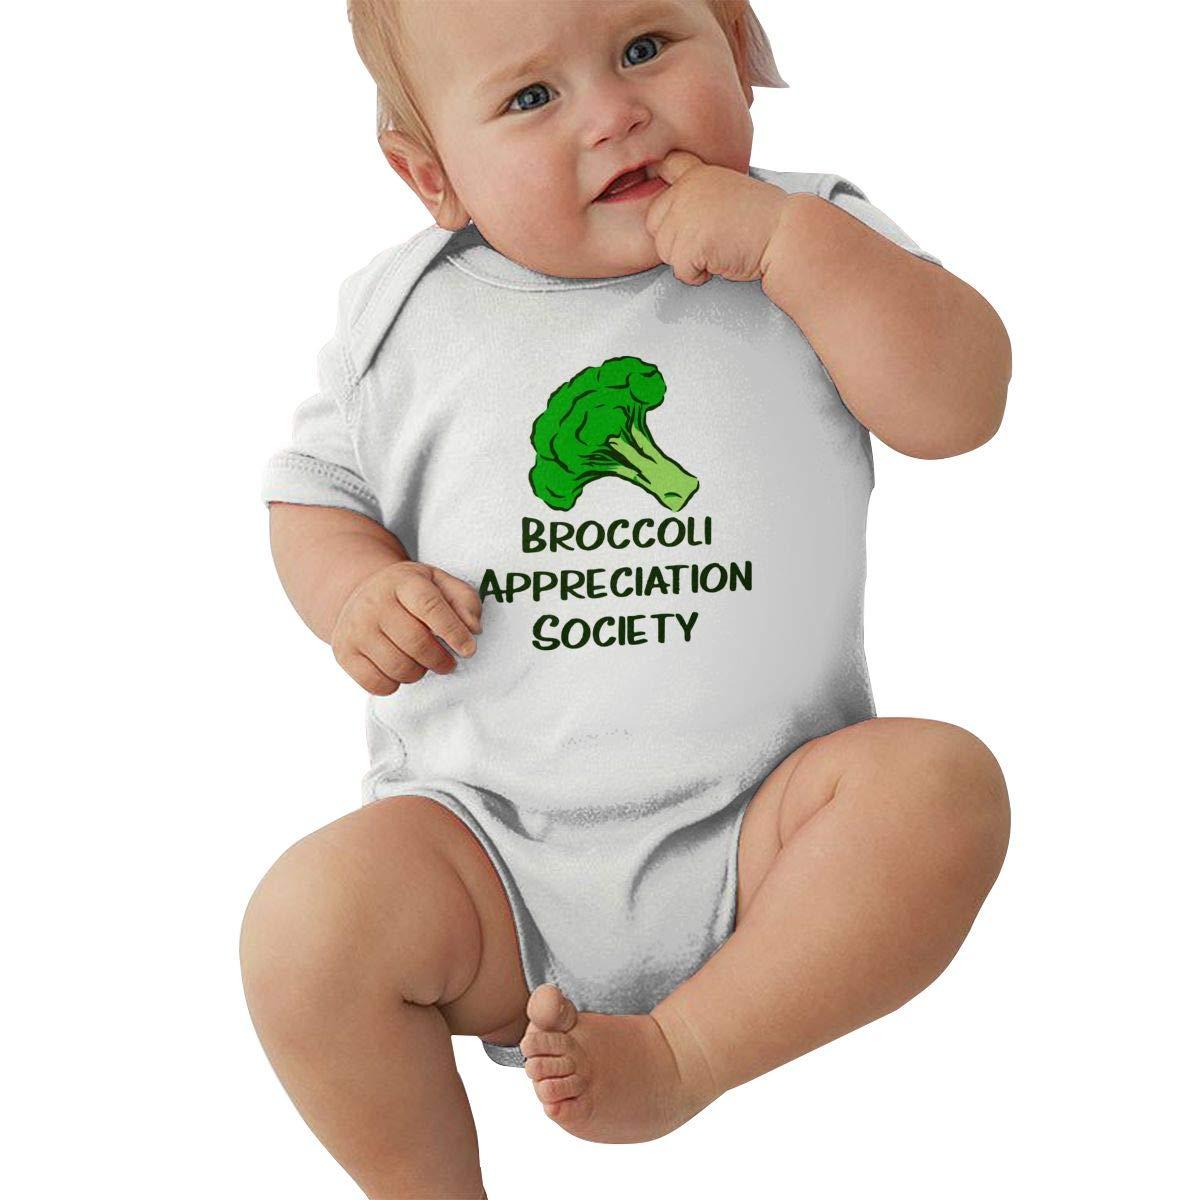 Broccoli Appreciation Society Vegan Baby Boys Organic Cotton Short Sleeve Pajamas Sleeper